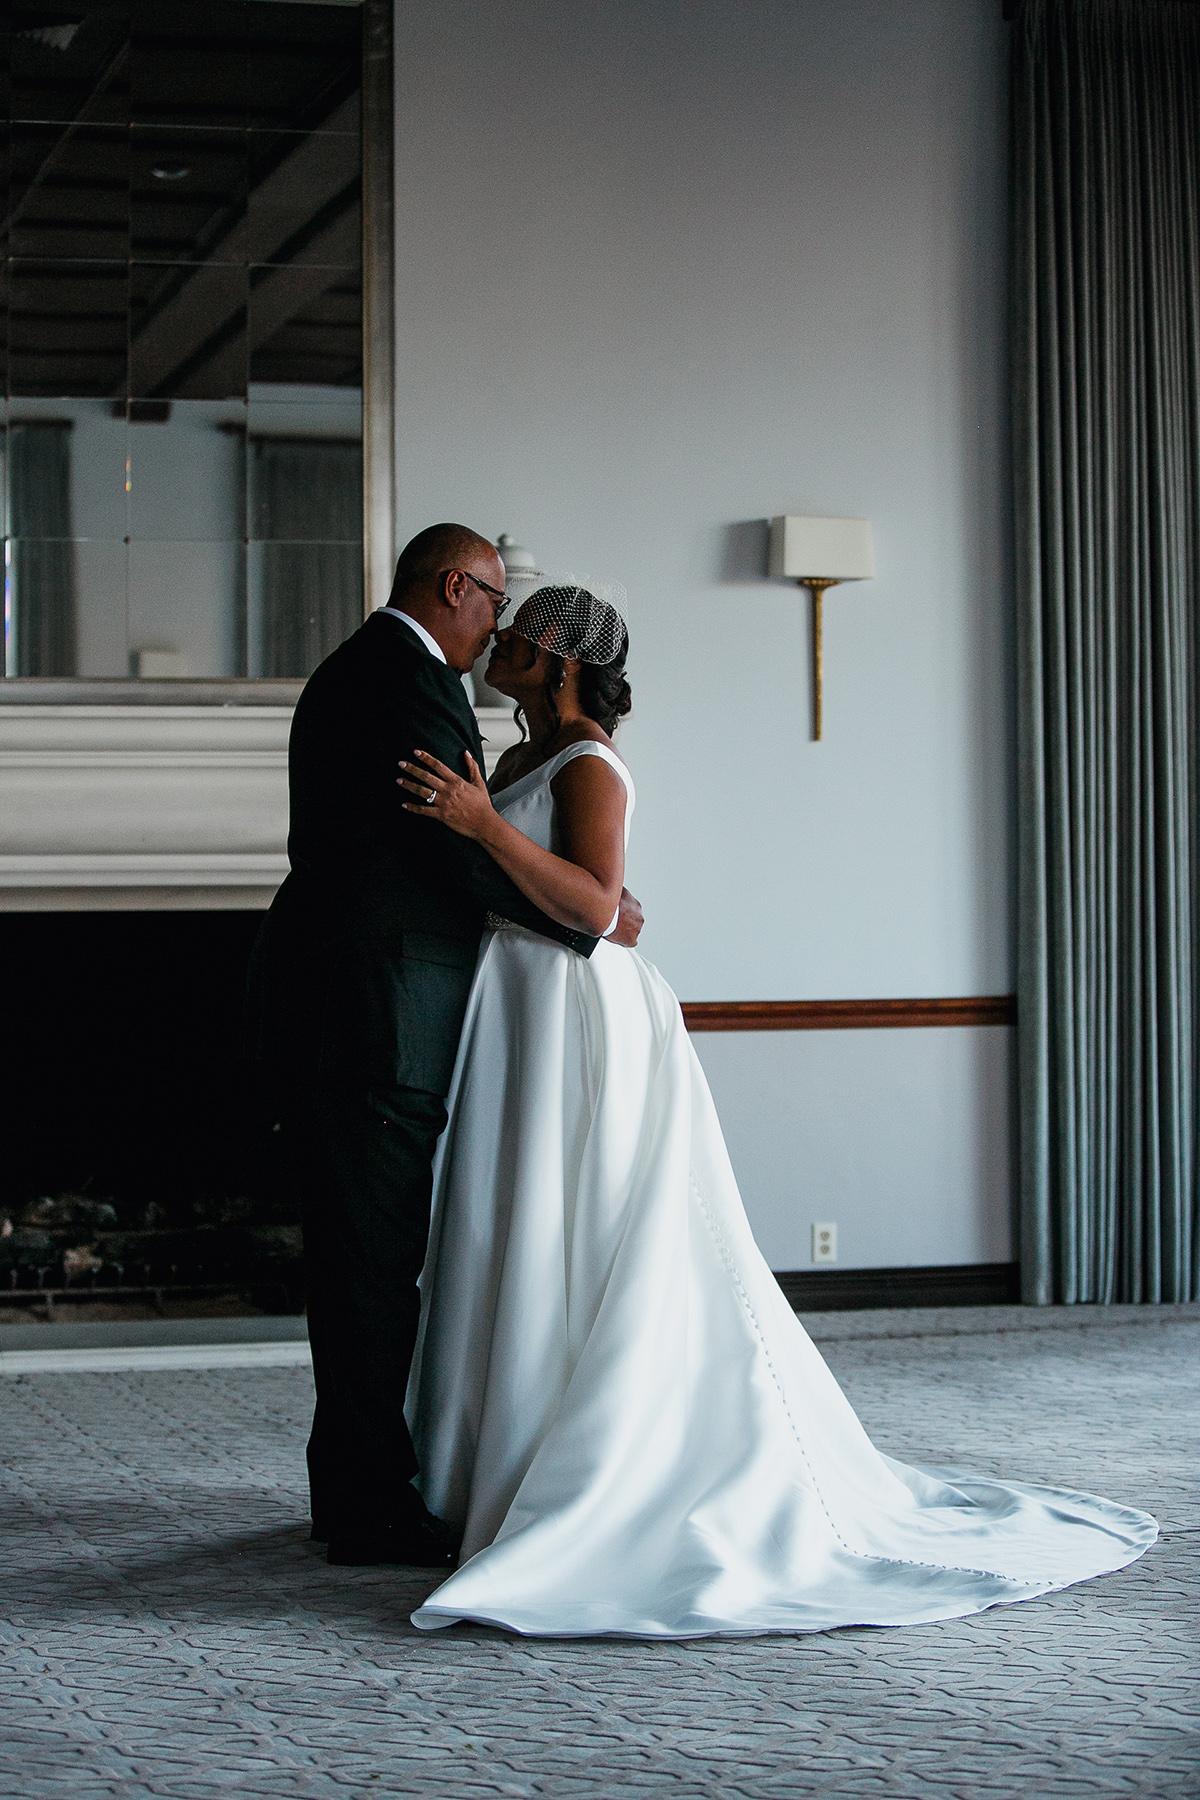 marla_david_wedding_074.jpg